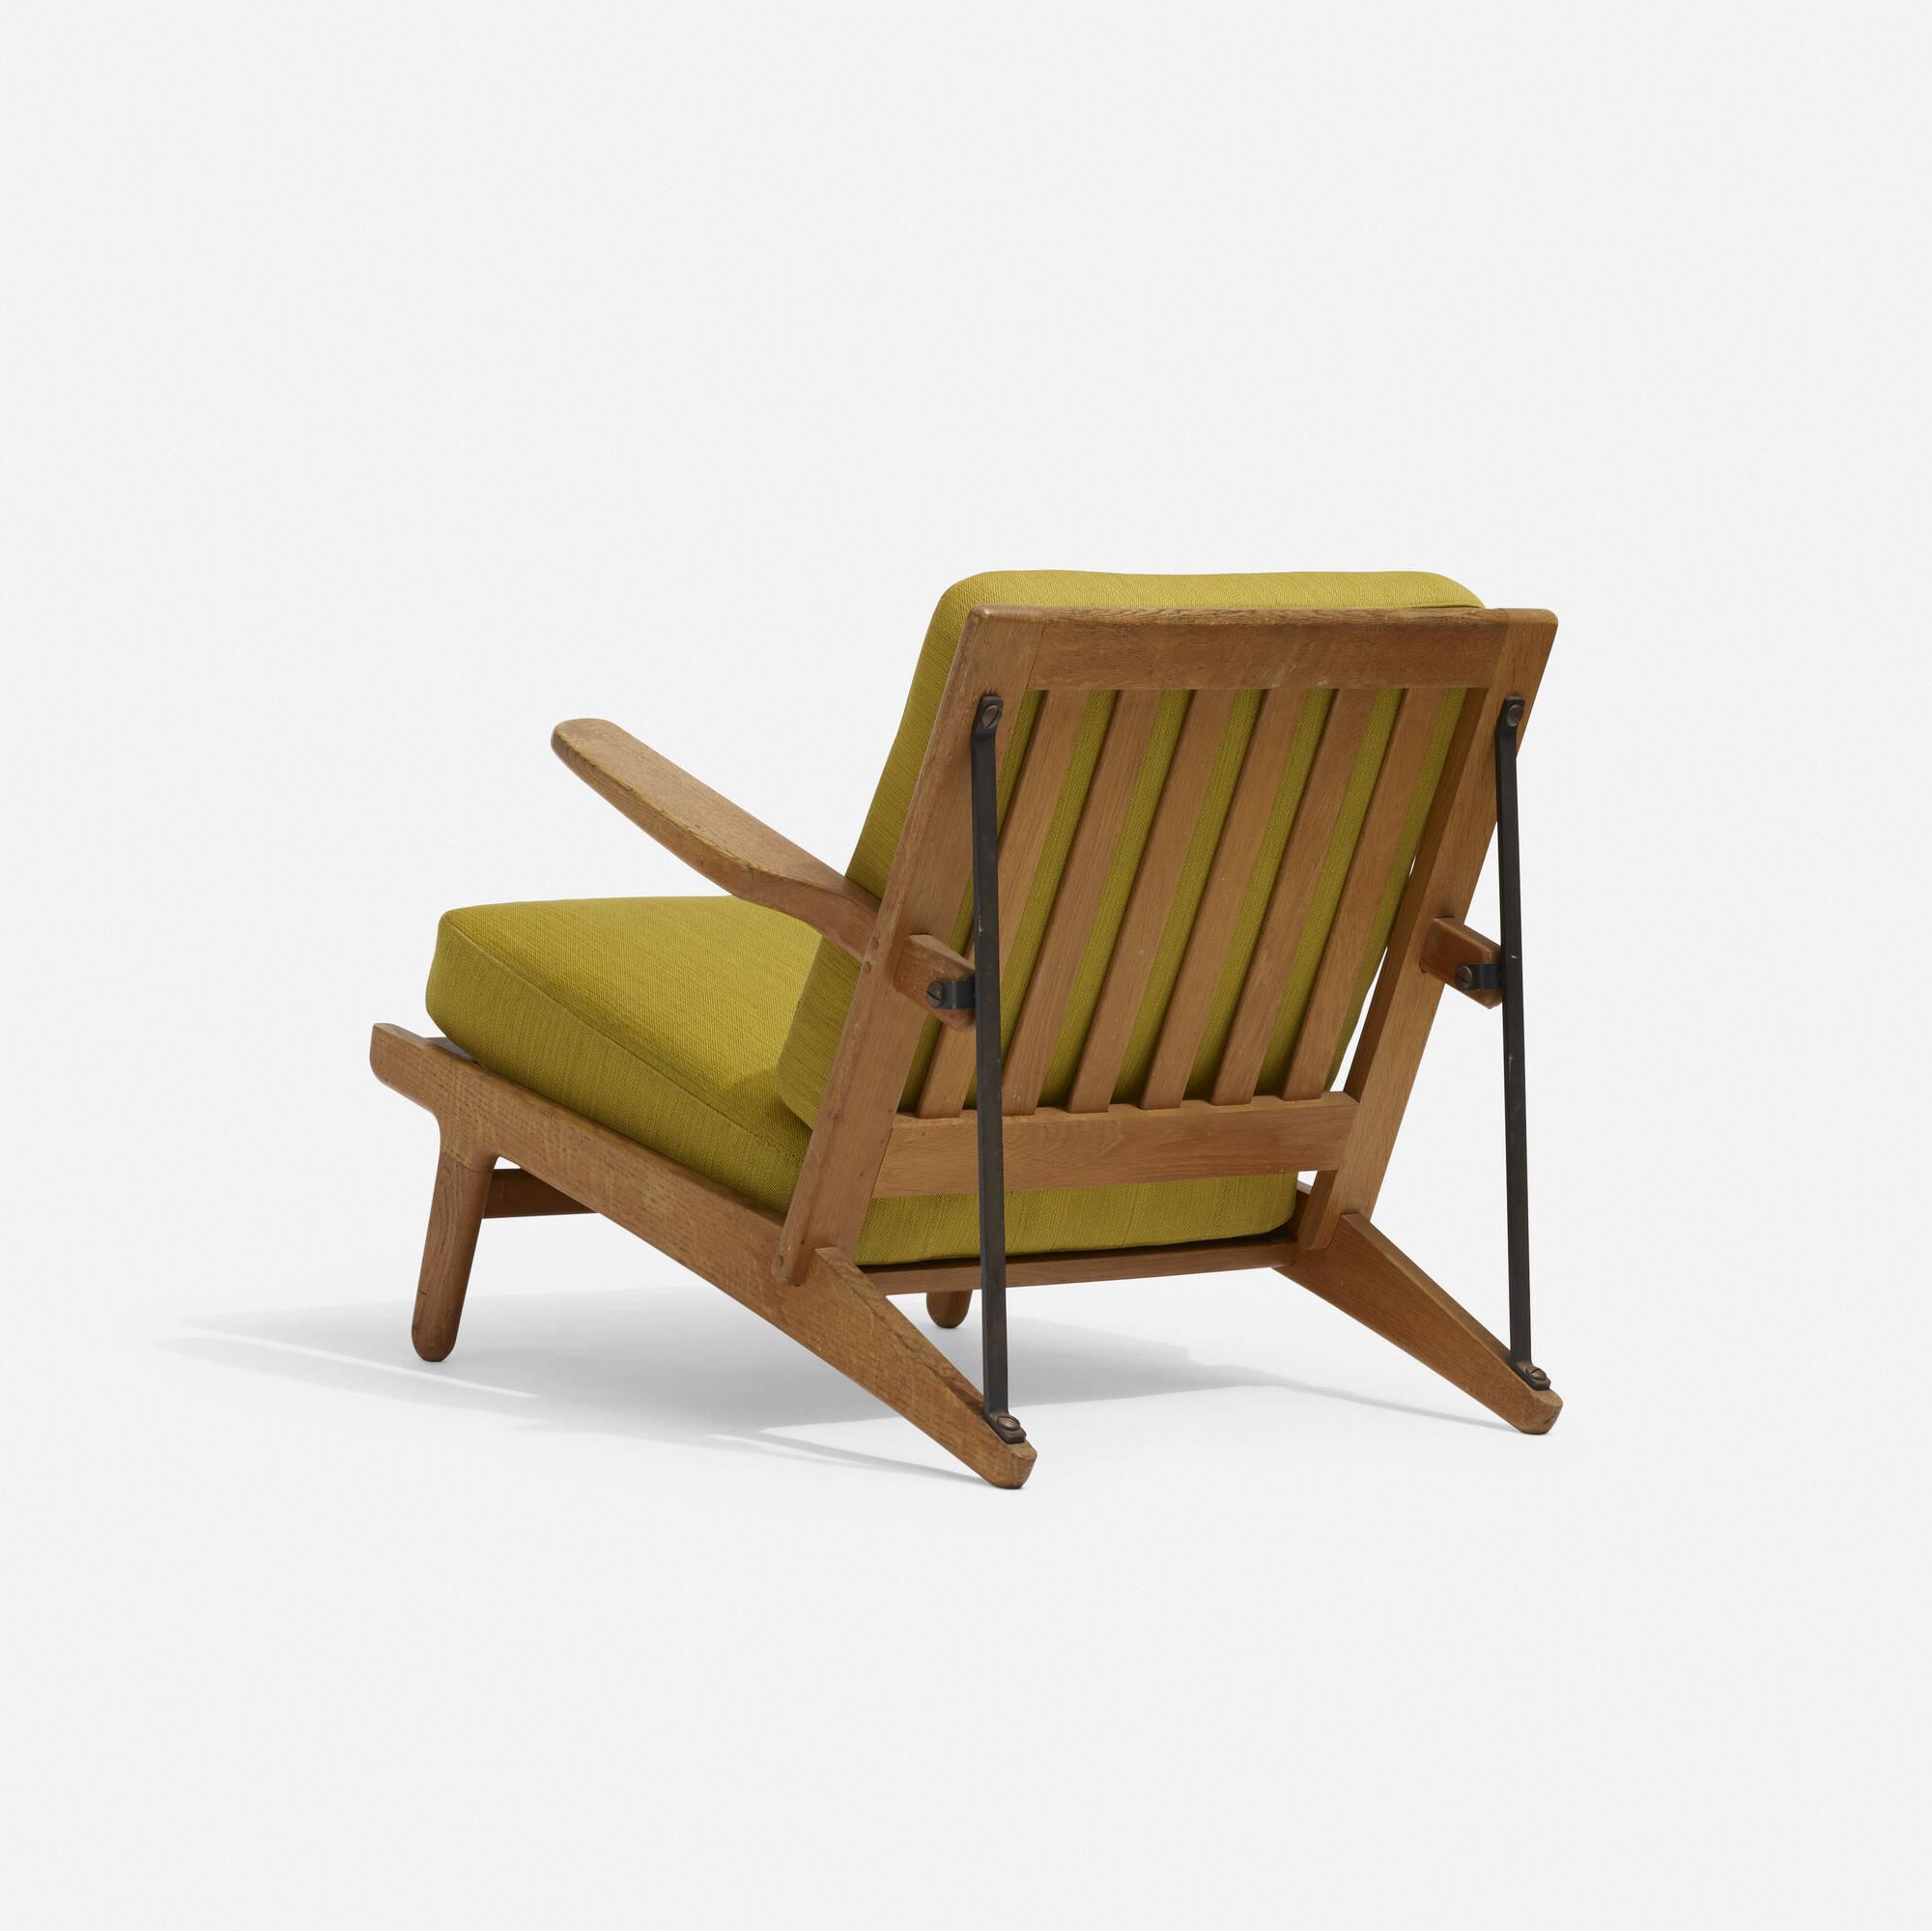 200: Børge Mogensen / Lounge Chair (1 Of 3)